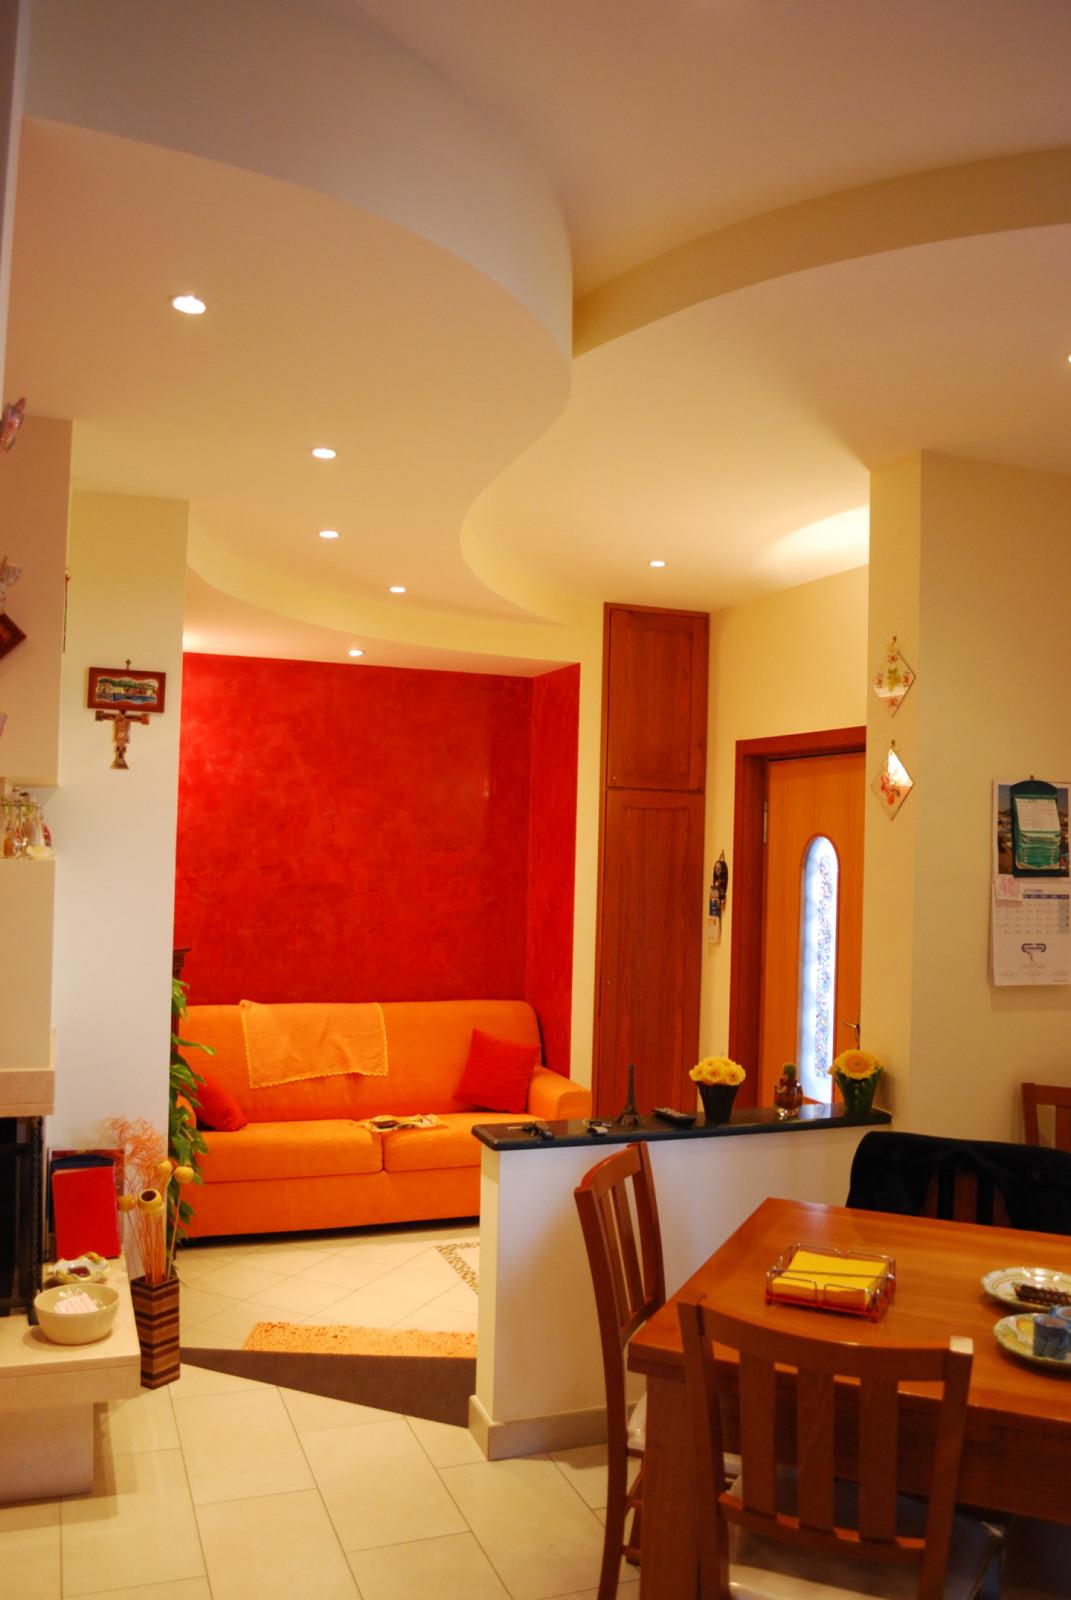 Casa av 08 studio di architettura marco ruocco - Apartamentos avenida ...